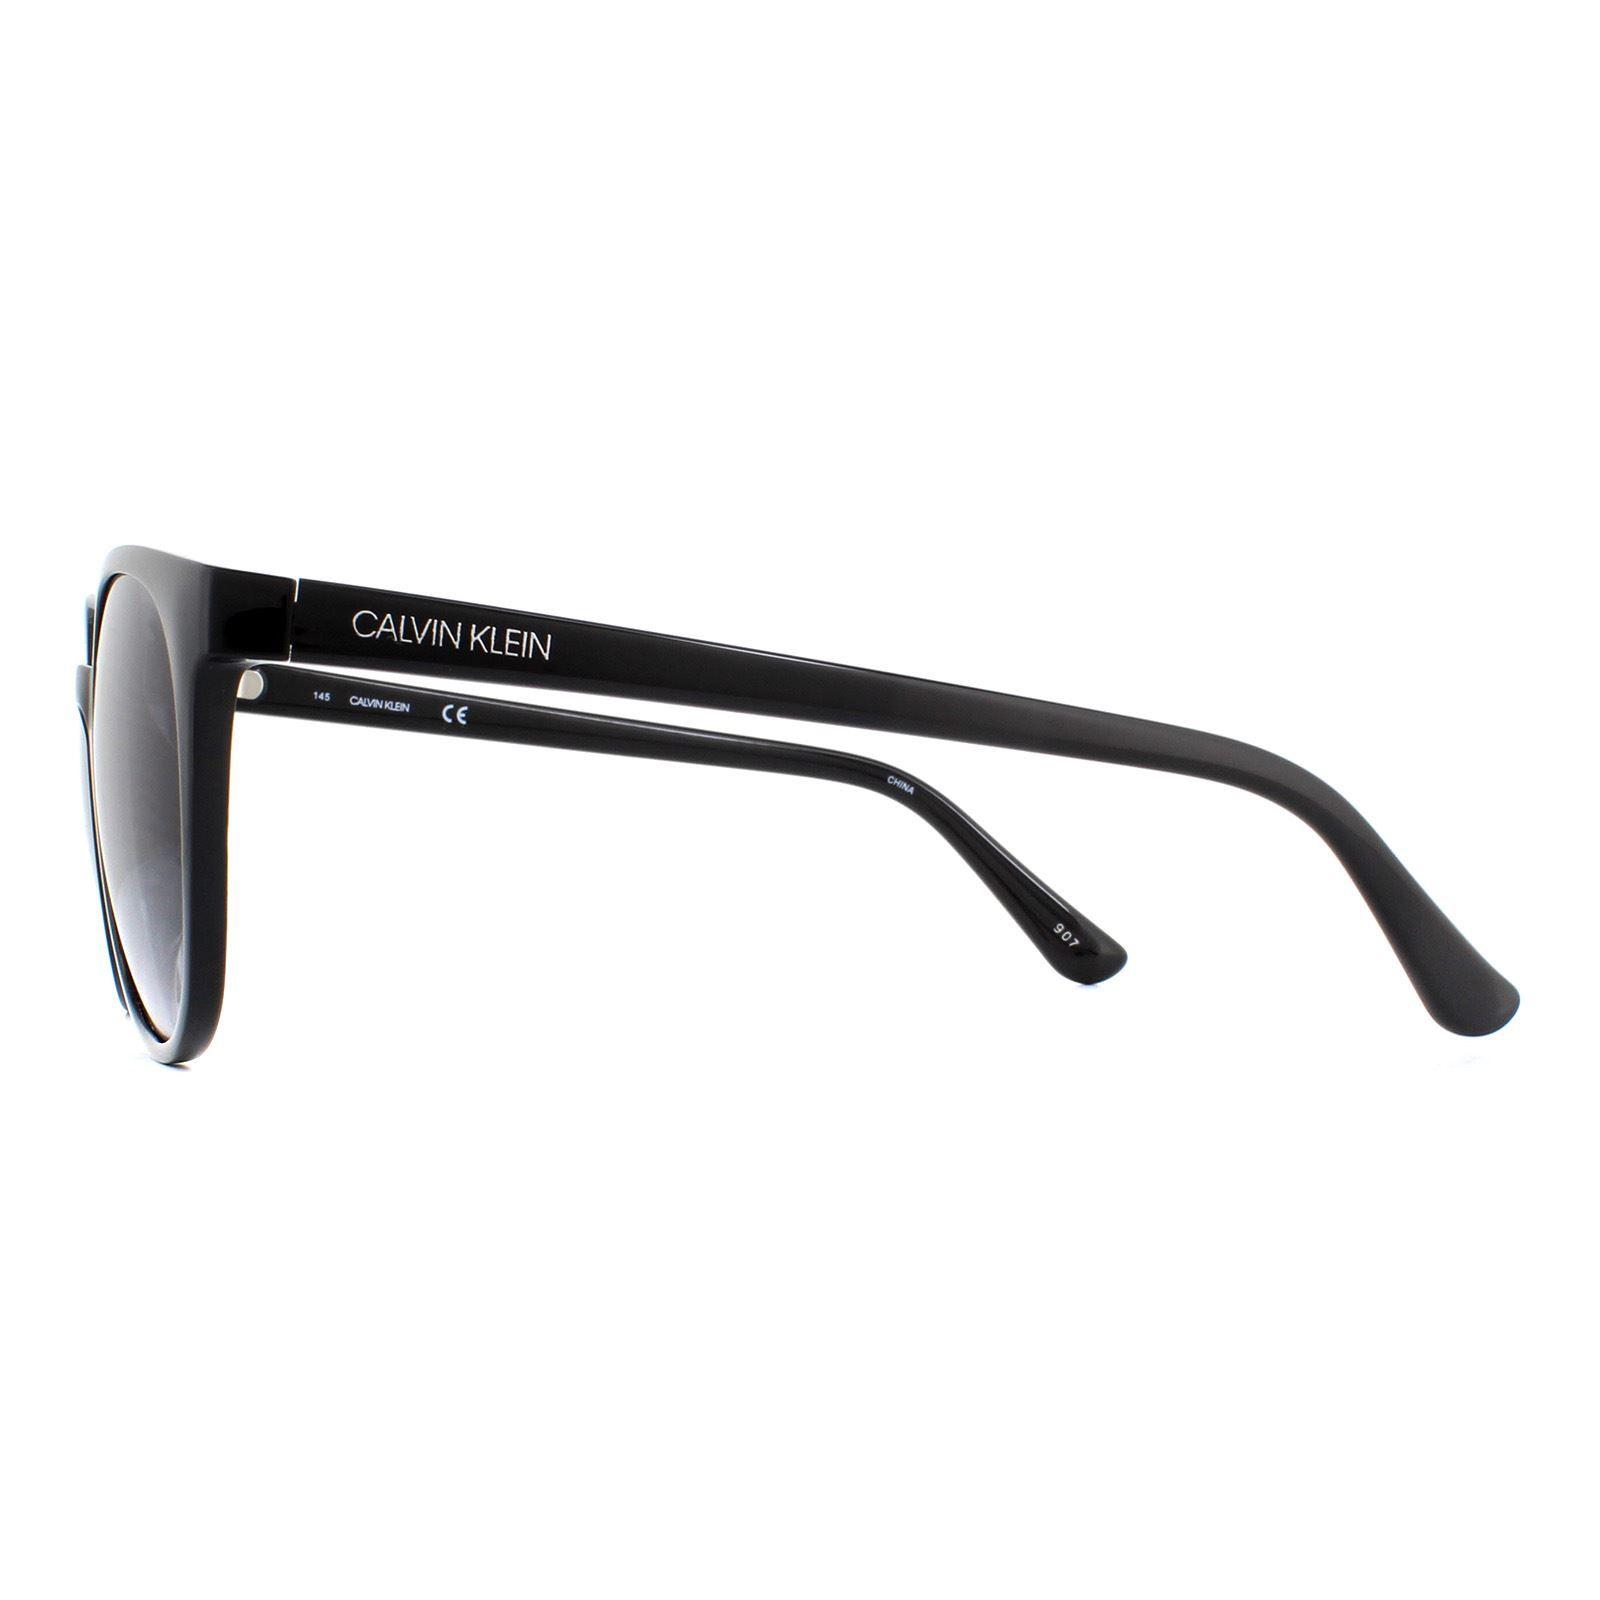 Calvin Klein Sunglasses CK19563S 001 Black Grey